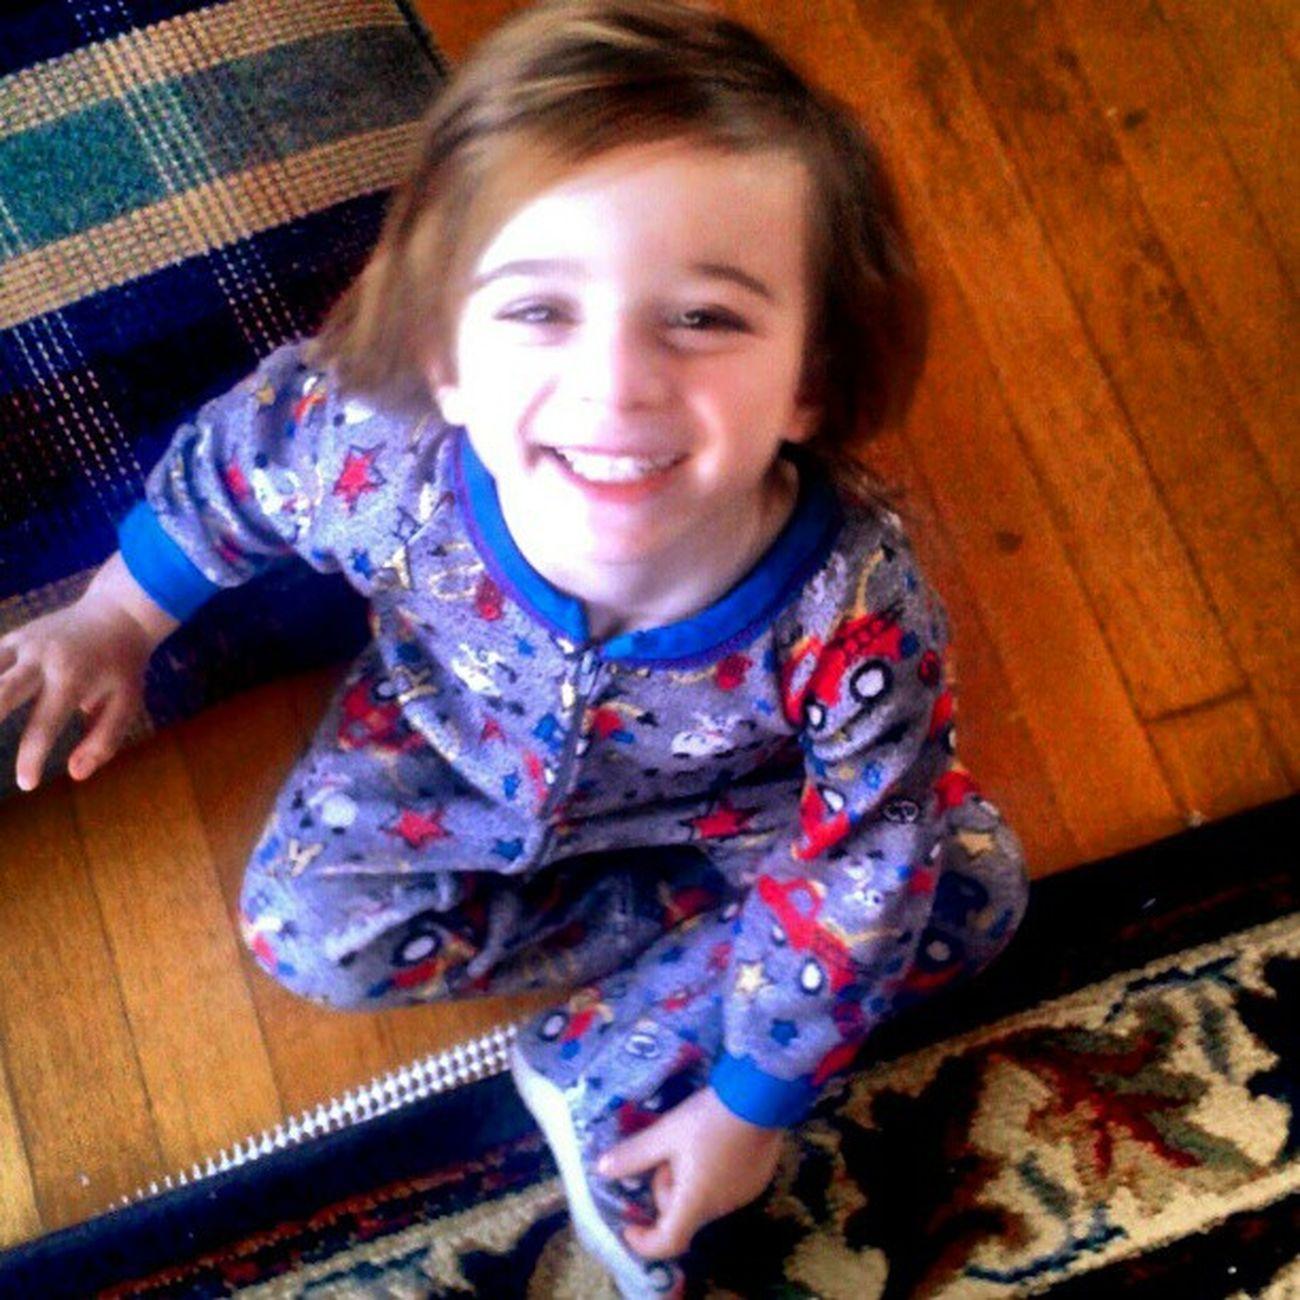 Tonio <3 Baby Cute 2yrs Pjs smile